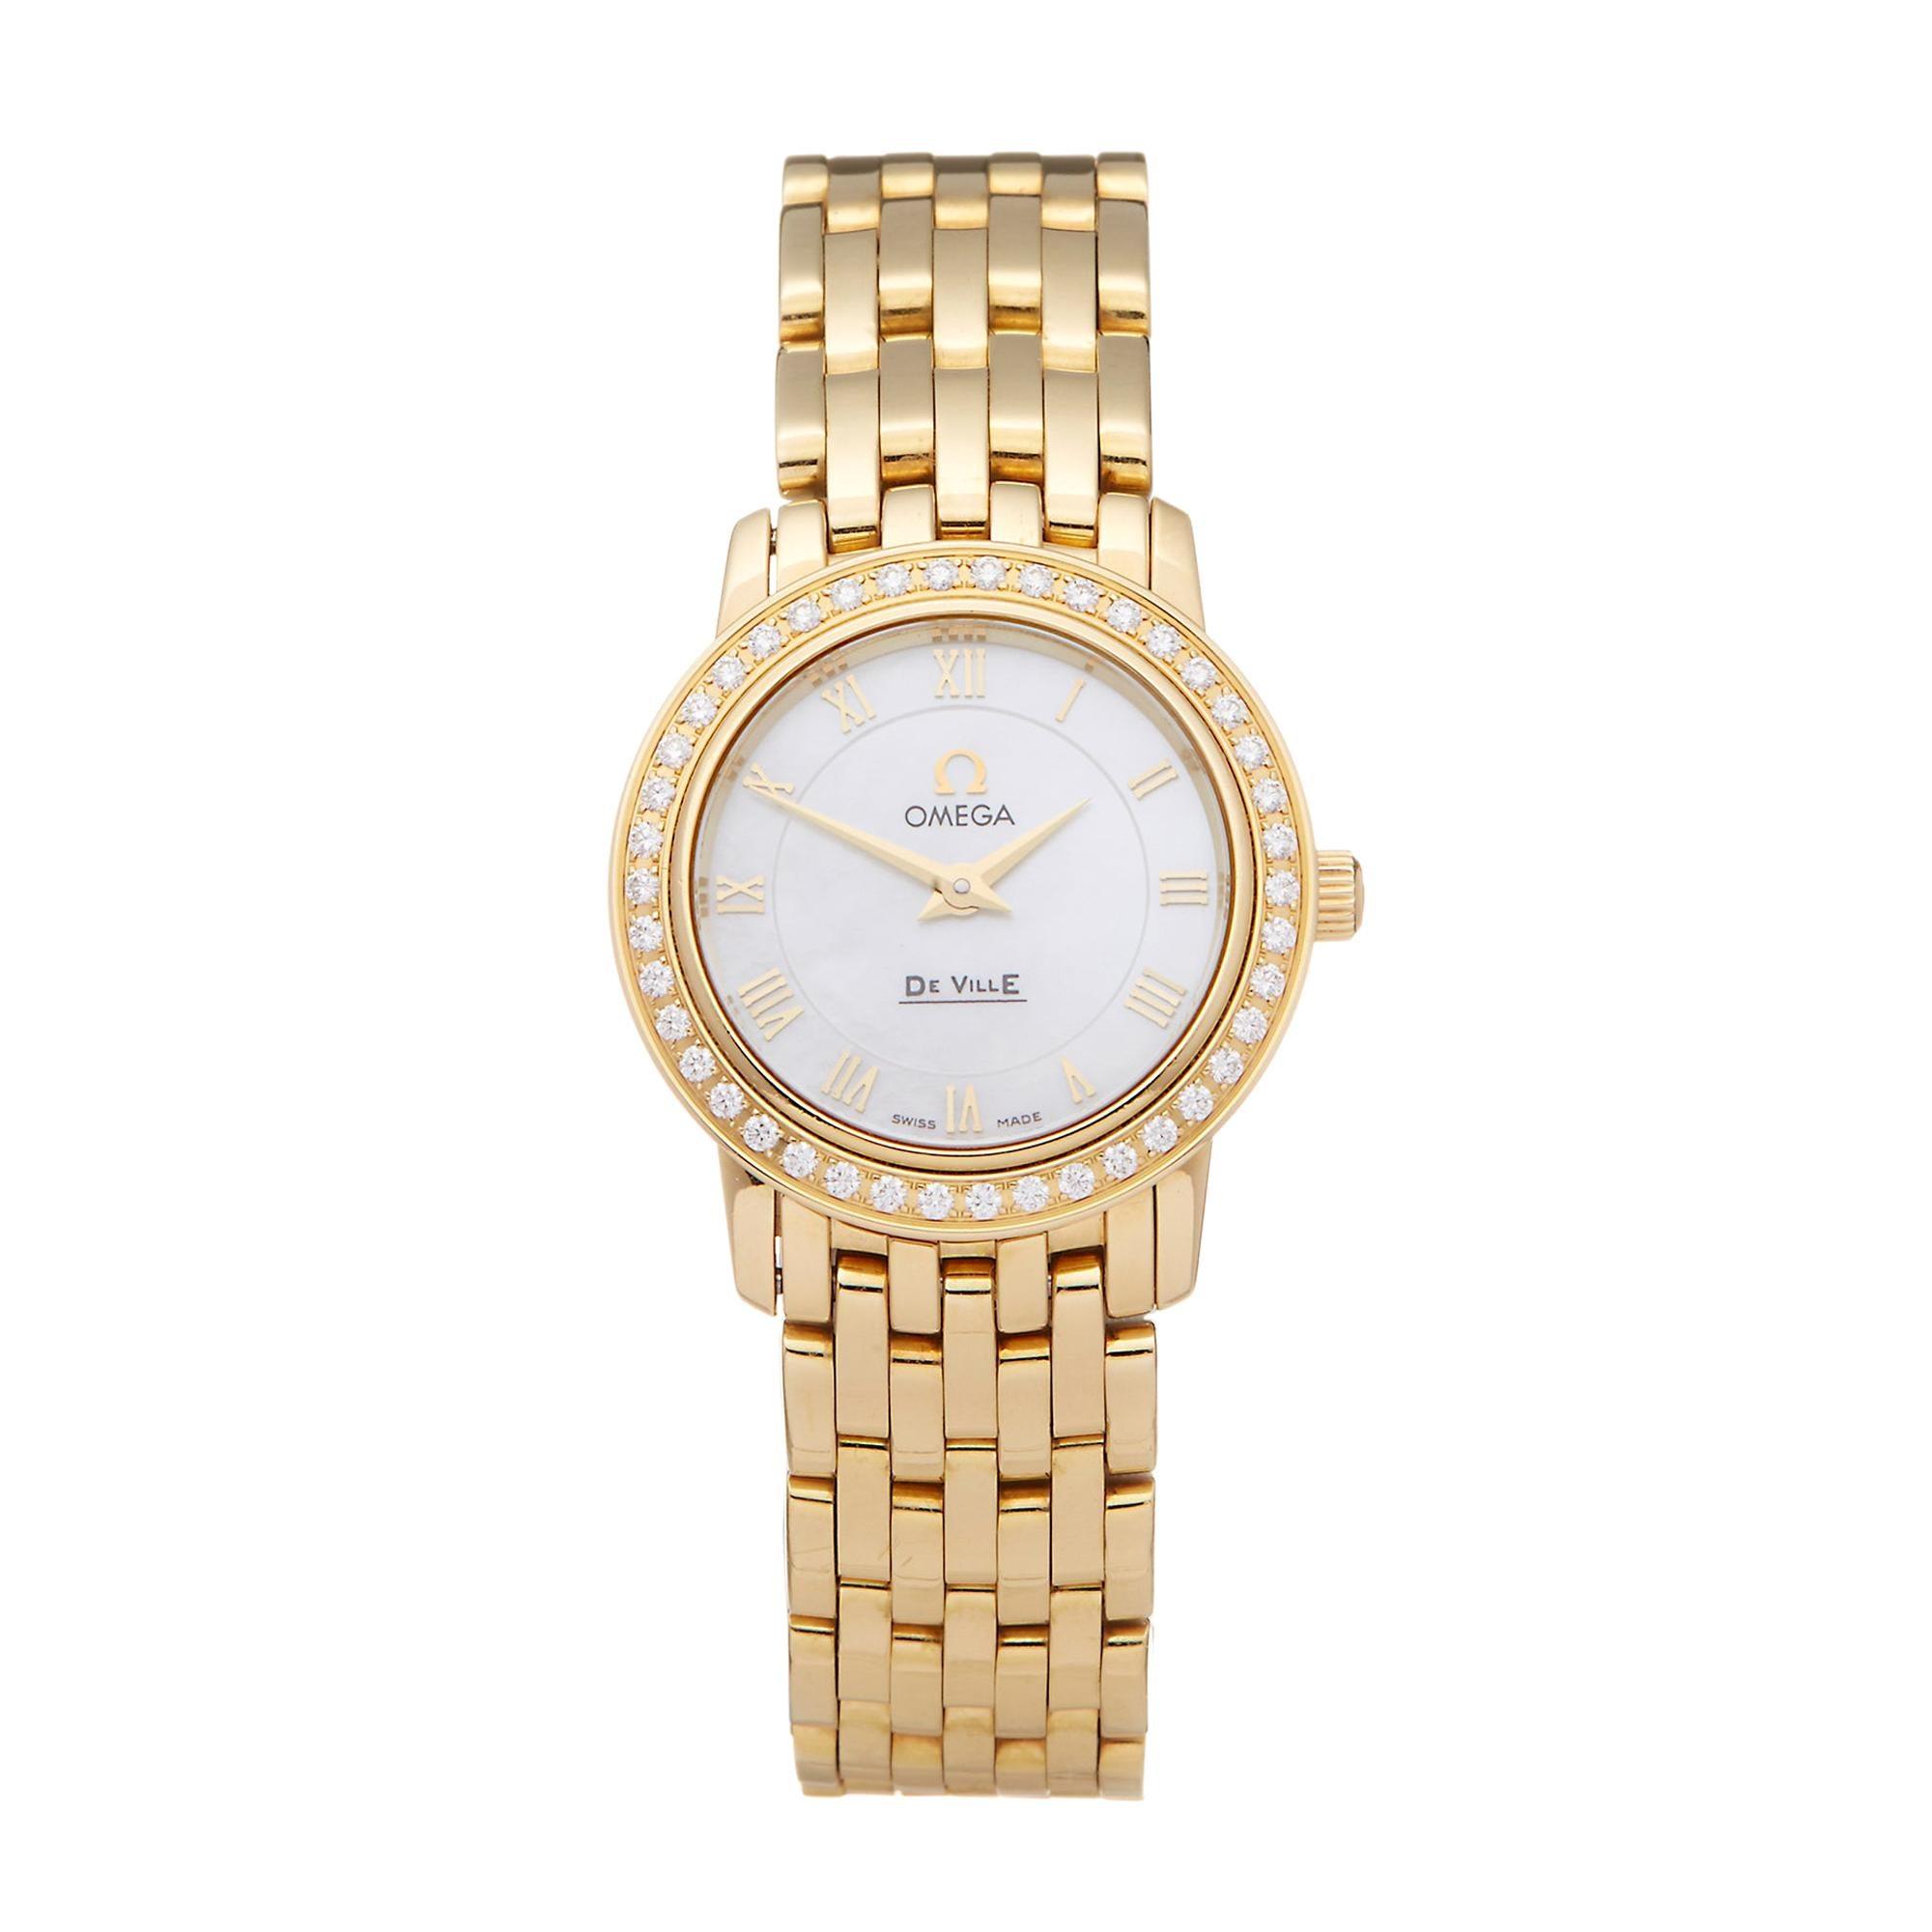 Omega De Ville Prestige Diamond 18 Karat Yellow Gold 41757100 Wristwatch